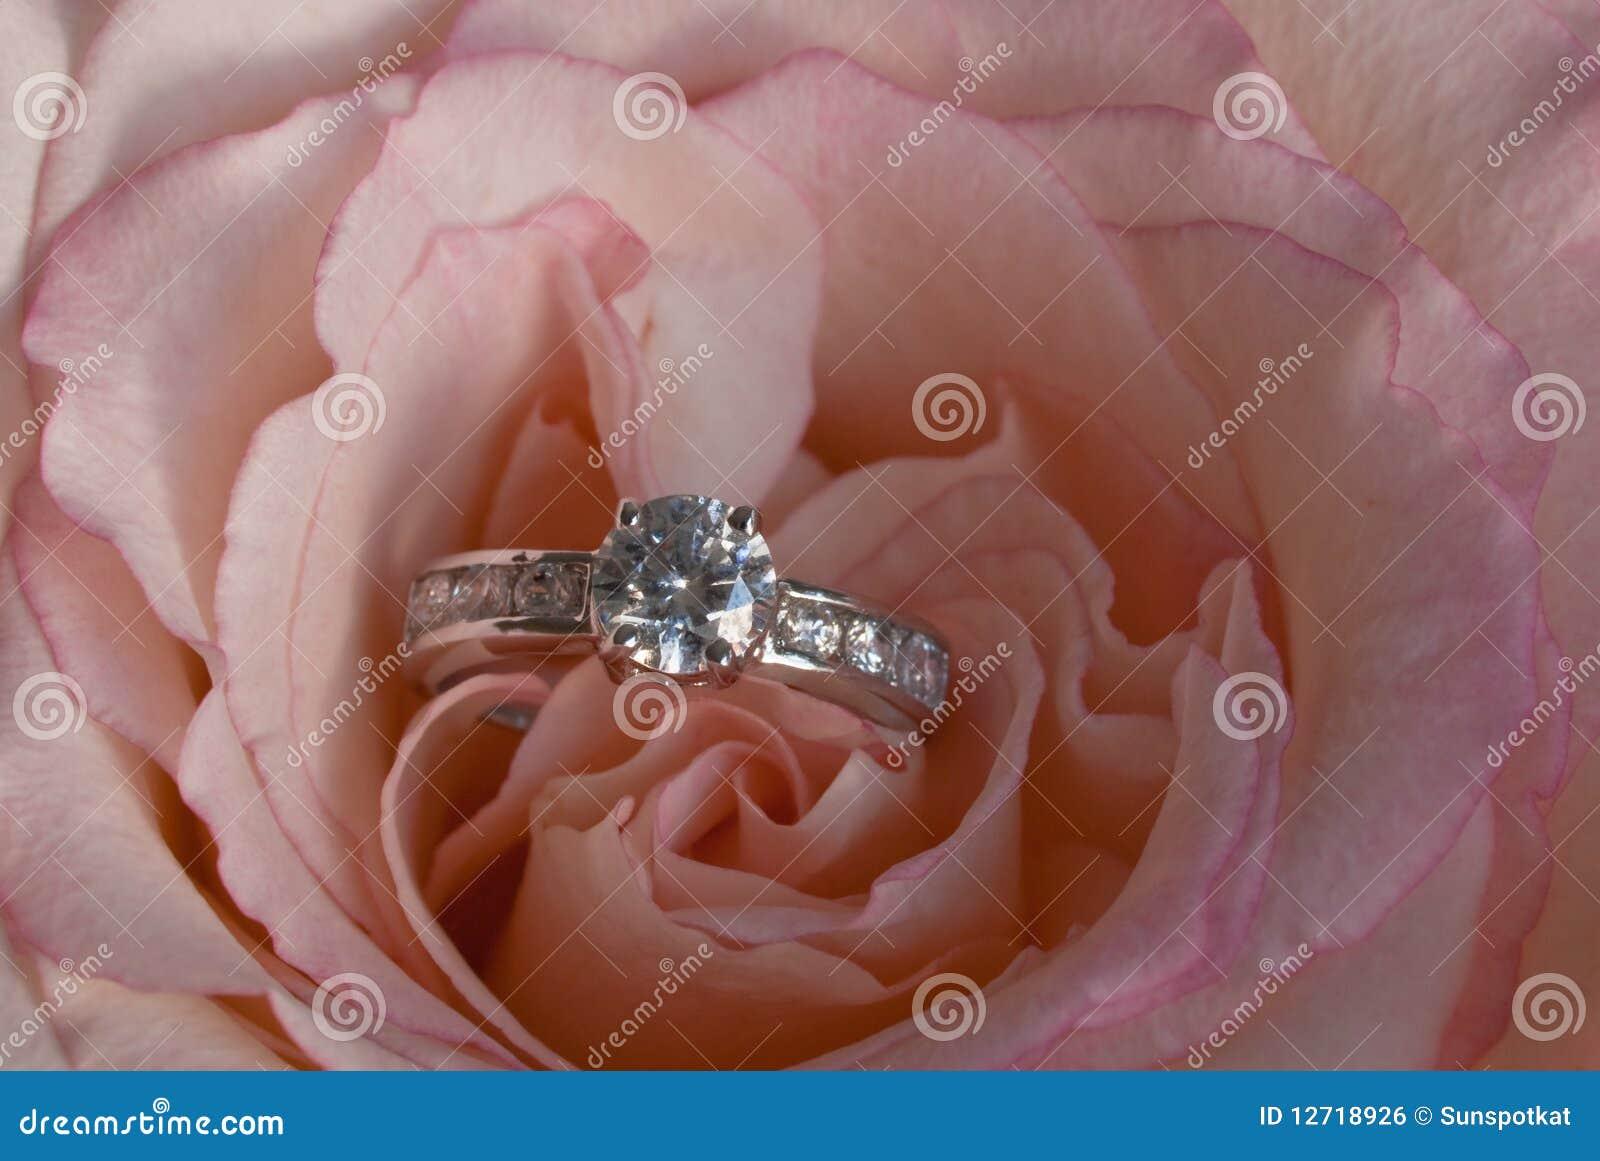 diamant ring im ausbreiten rosa rose lizenzfreies. Black Bedroom Furniture Sets. Home Design Ideas